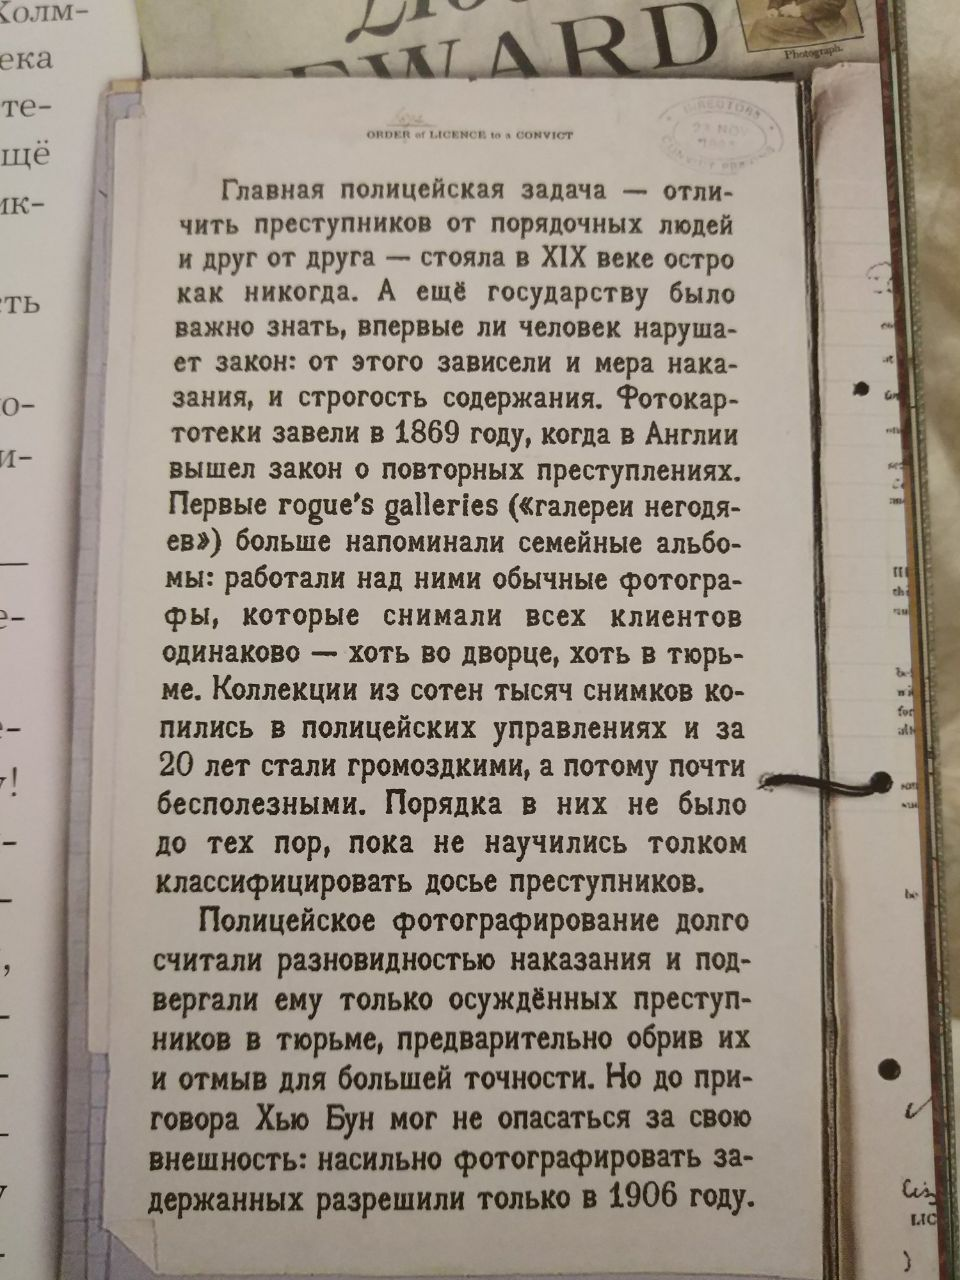 http://s7.uploads.ru/it5Hu.jpg